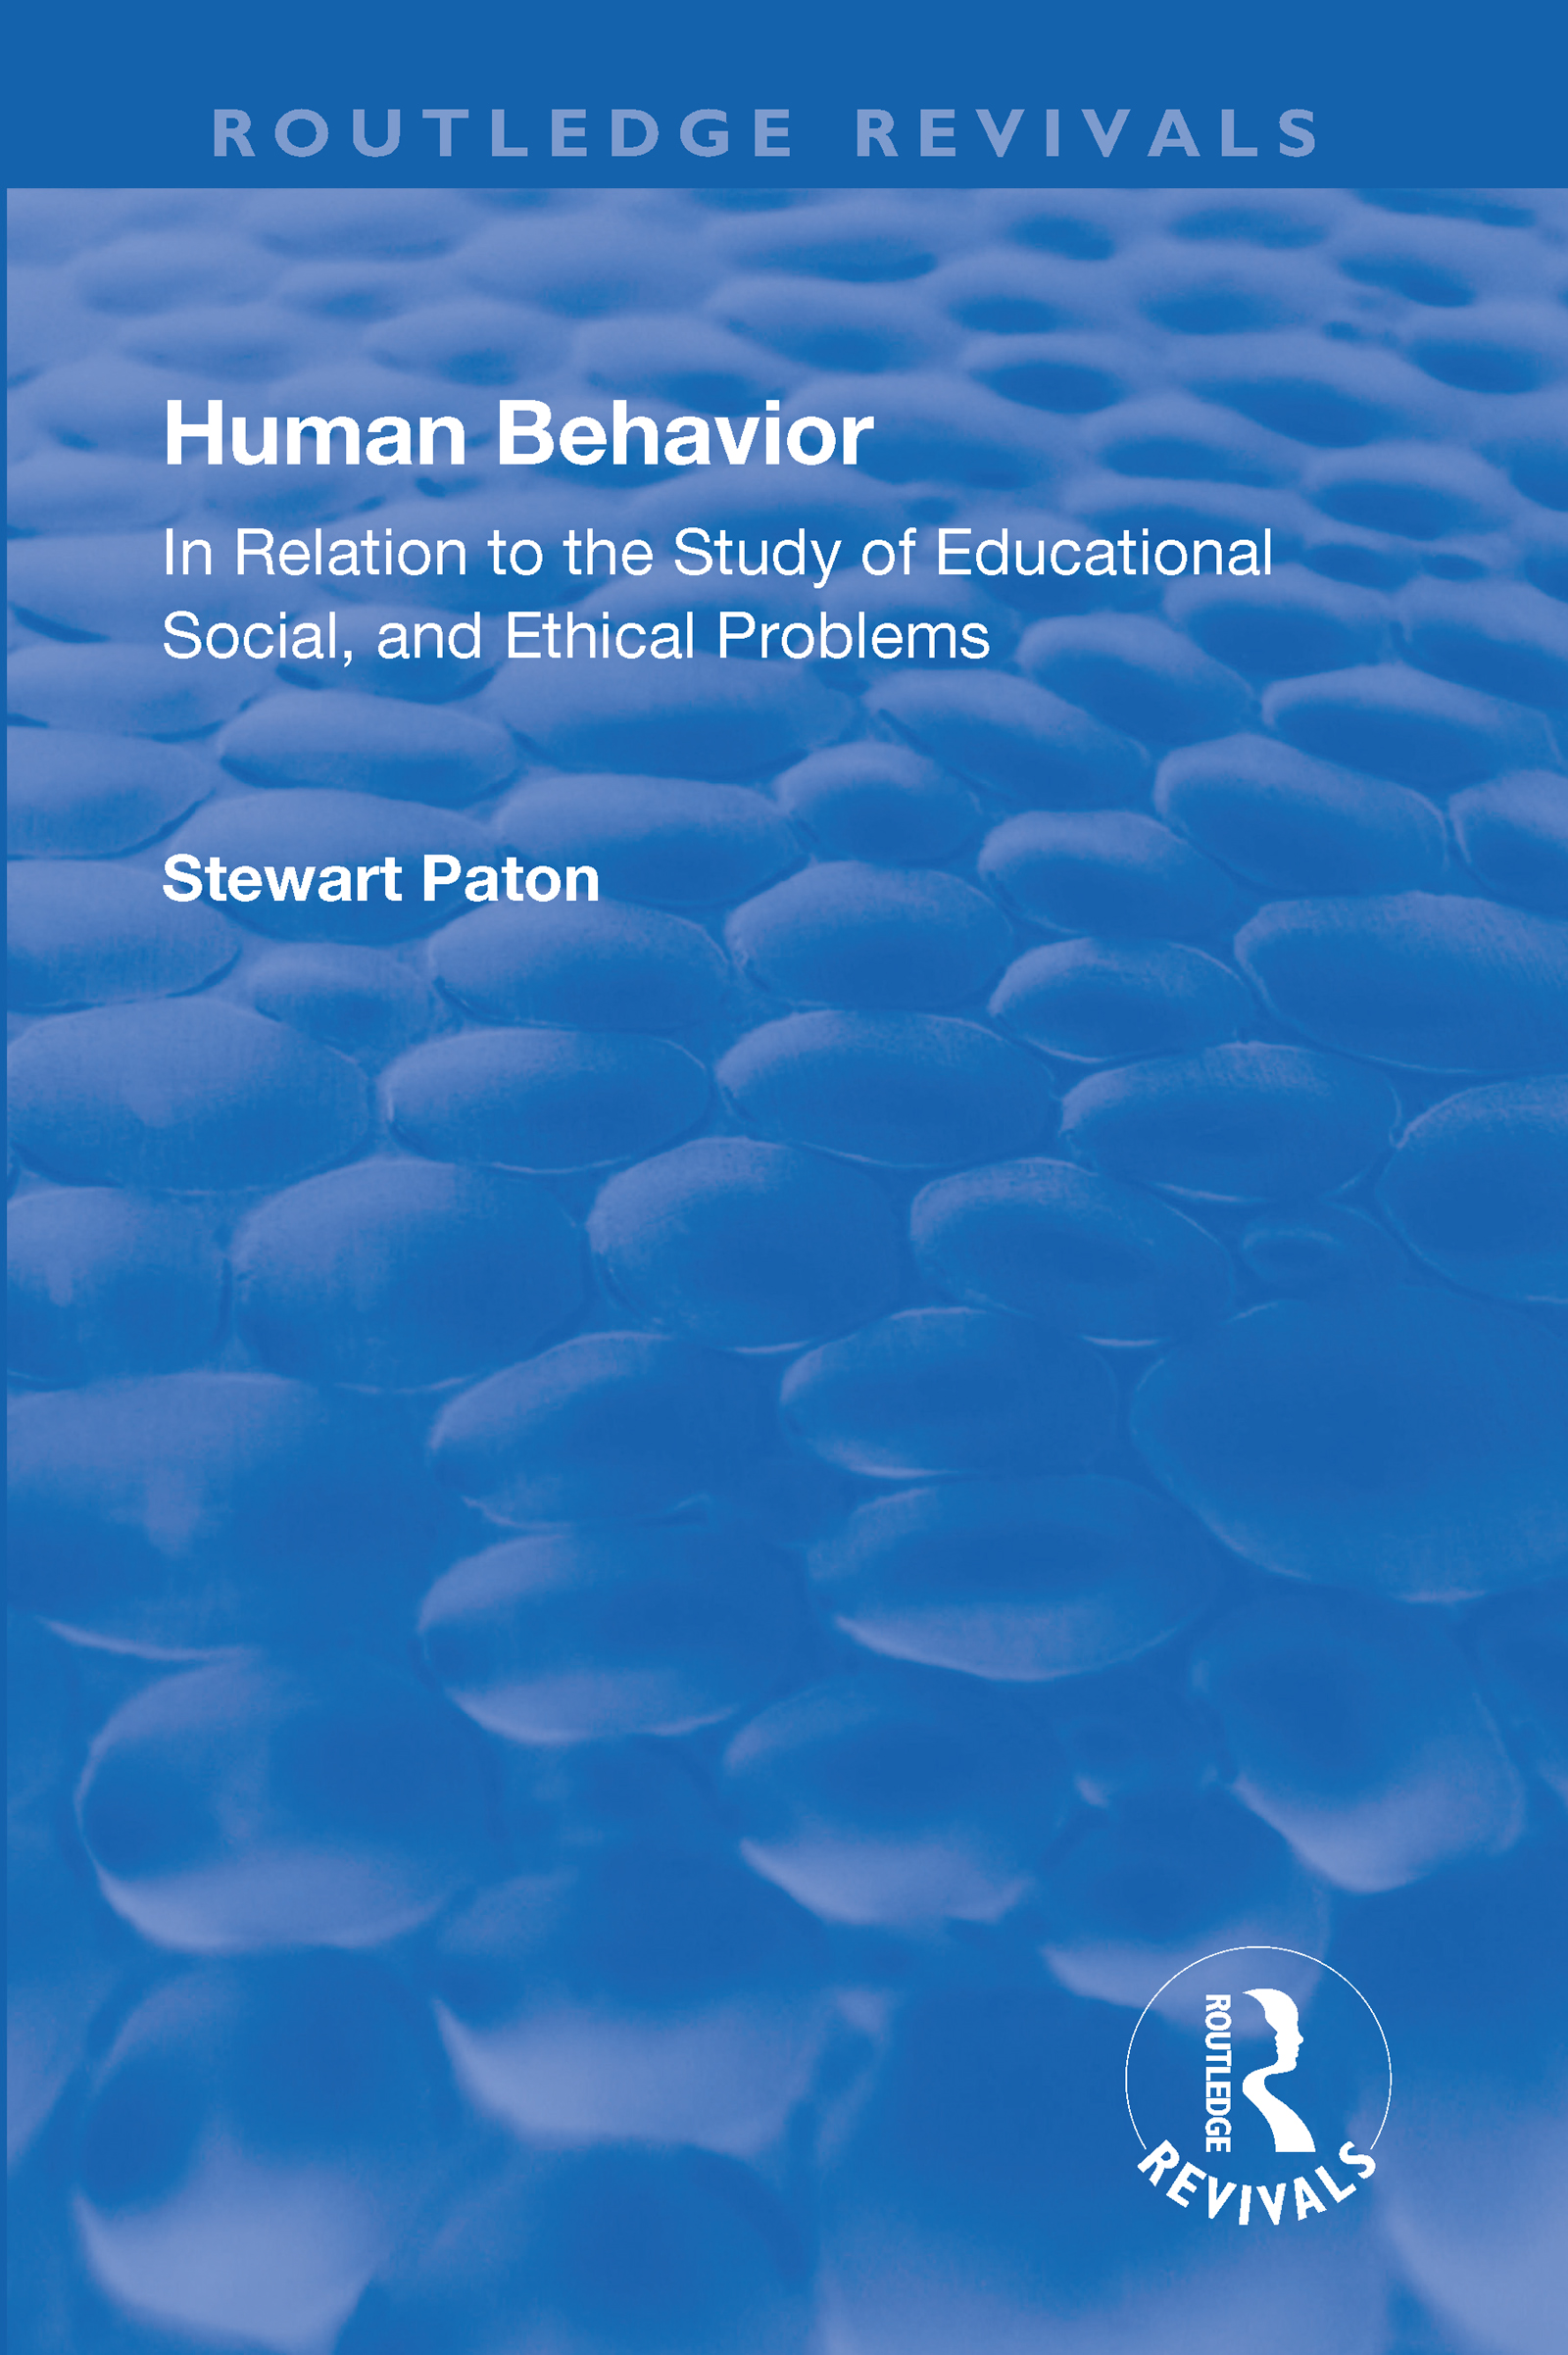 Revival: Human Behavior (1921)